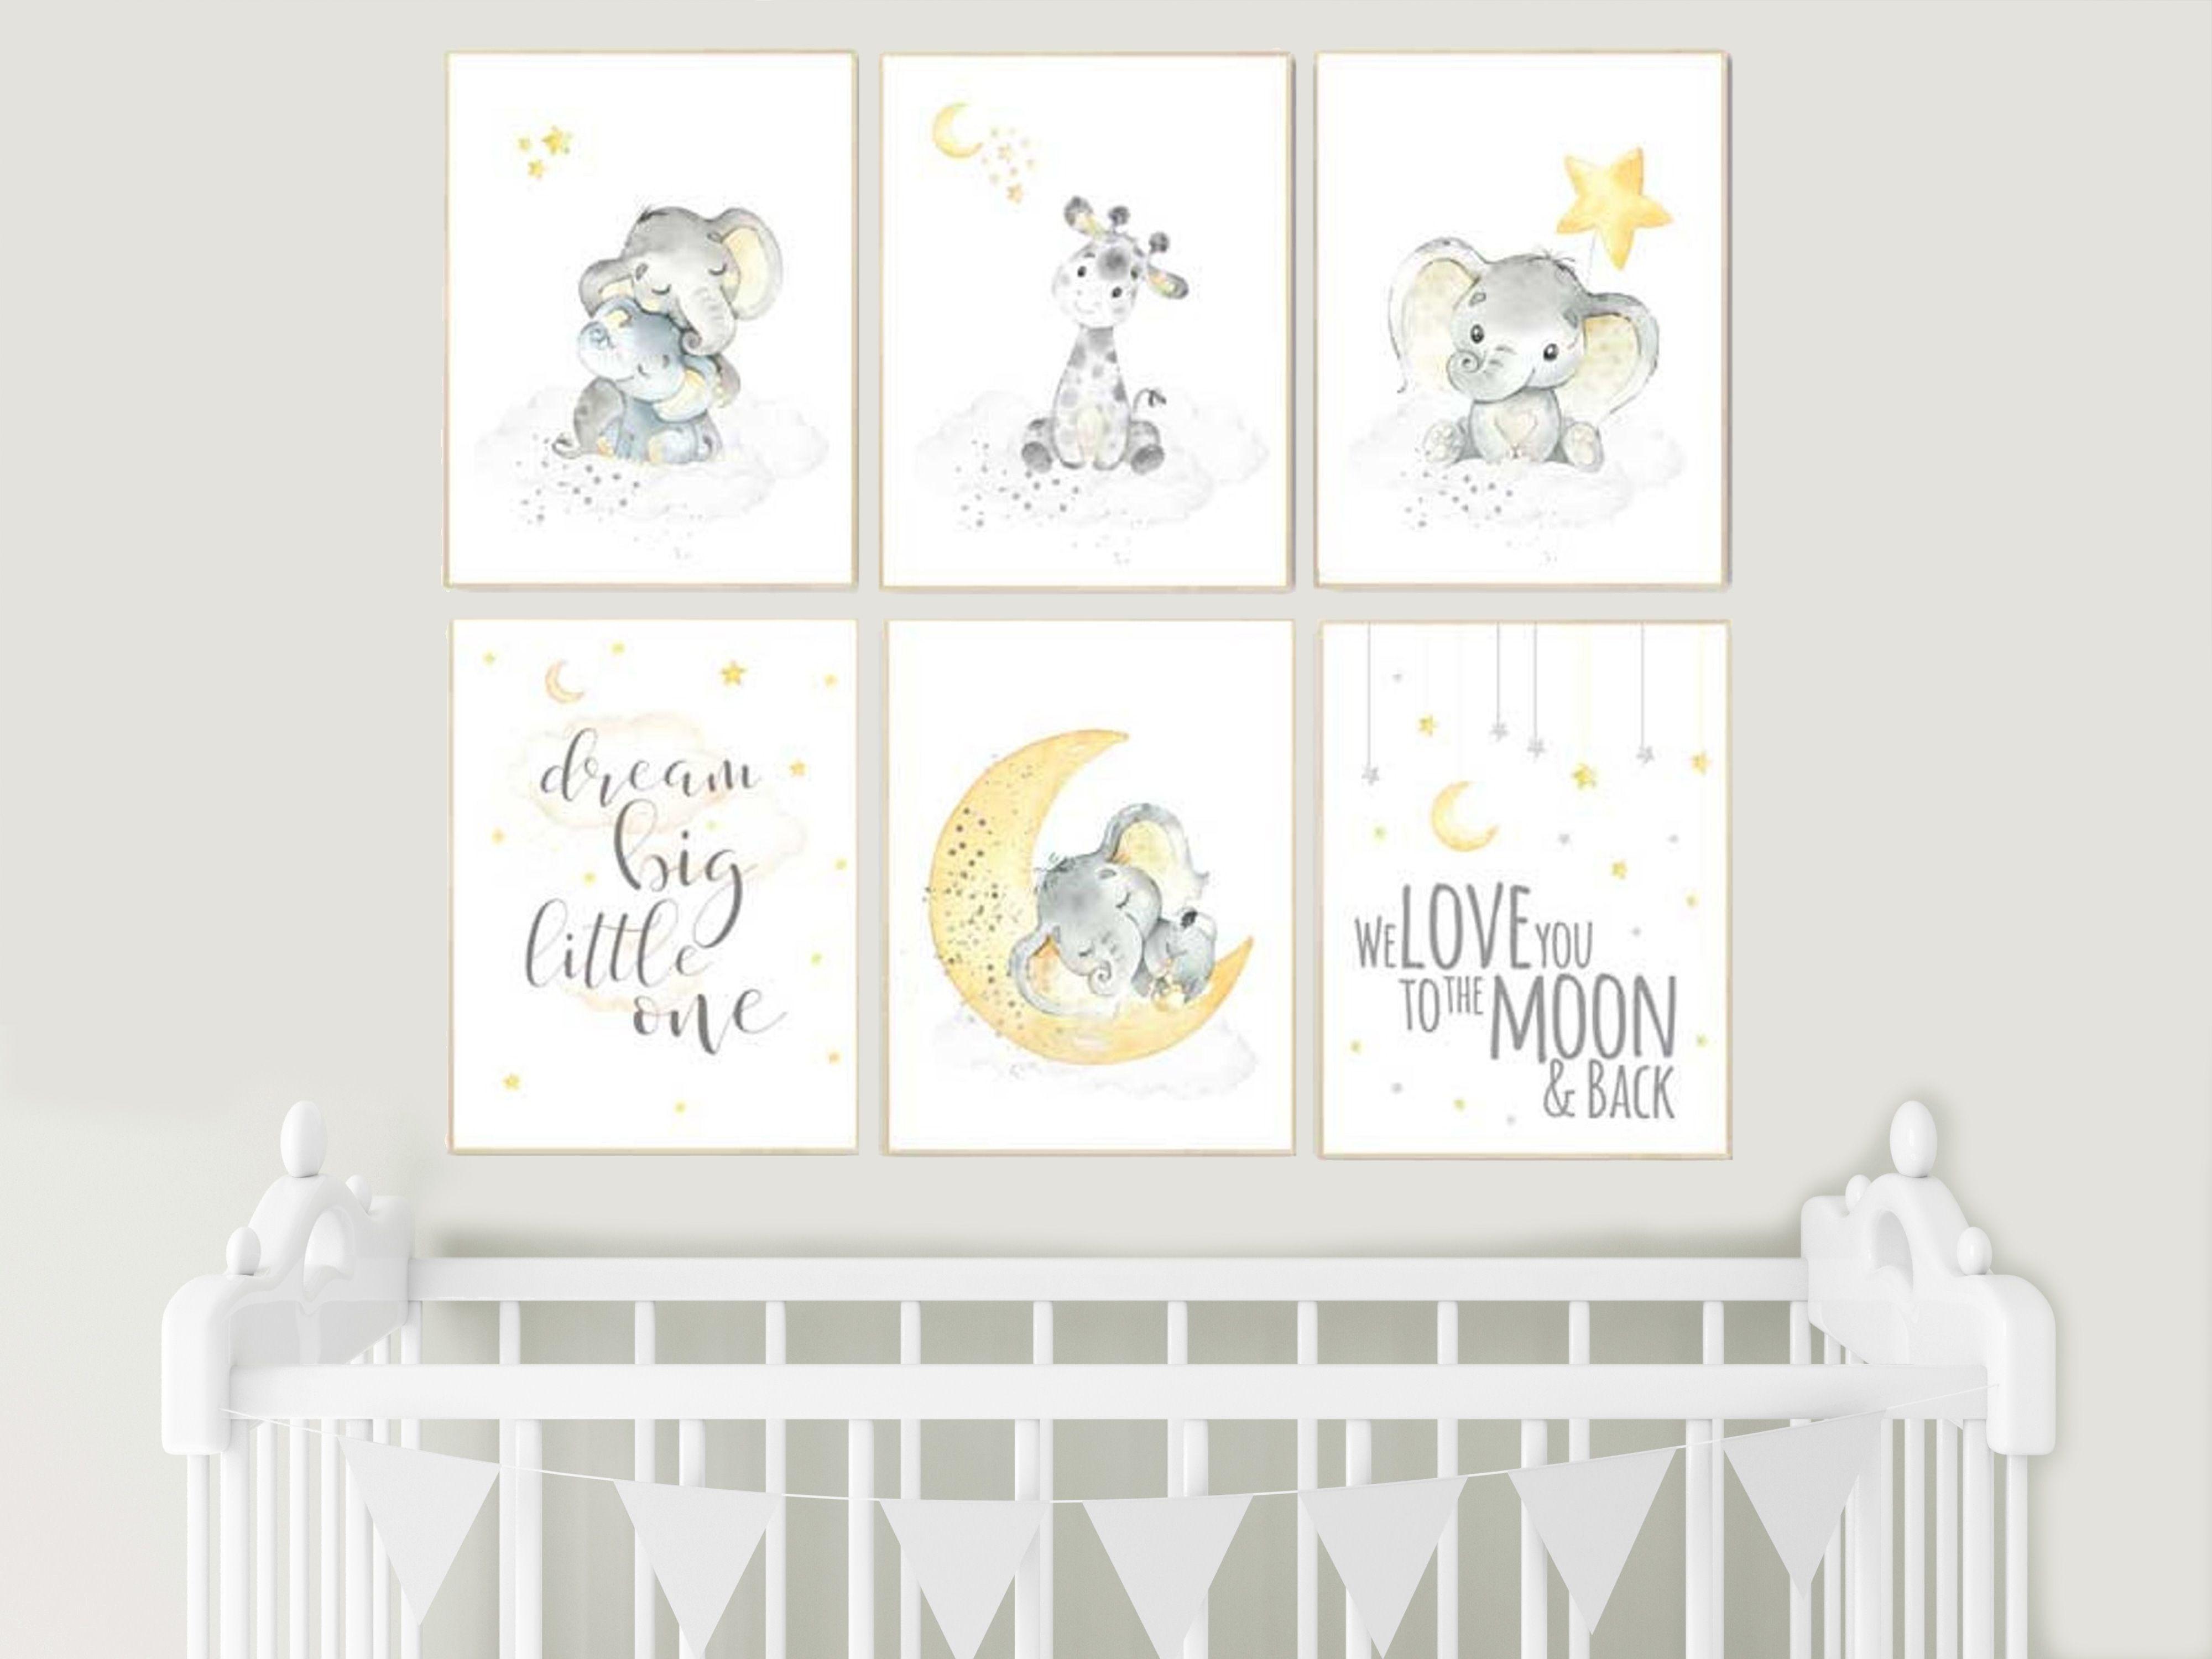 Yellow Gray Yellow Grey Gender Neutral Nursery Wall Art Etsy Gender Neutral Nursery Gray Gender Neutral Nursery Baby Room Wall Art